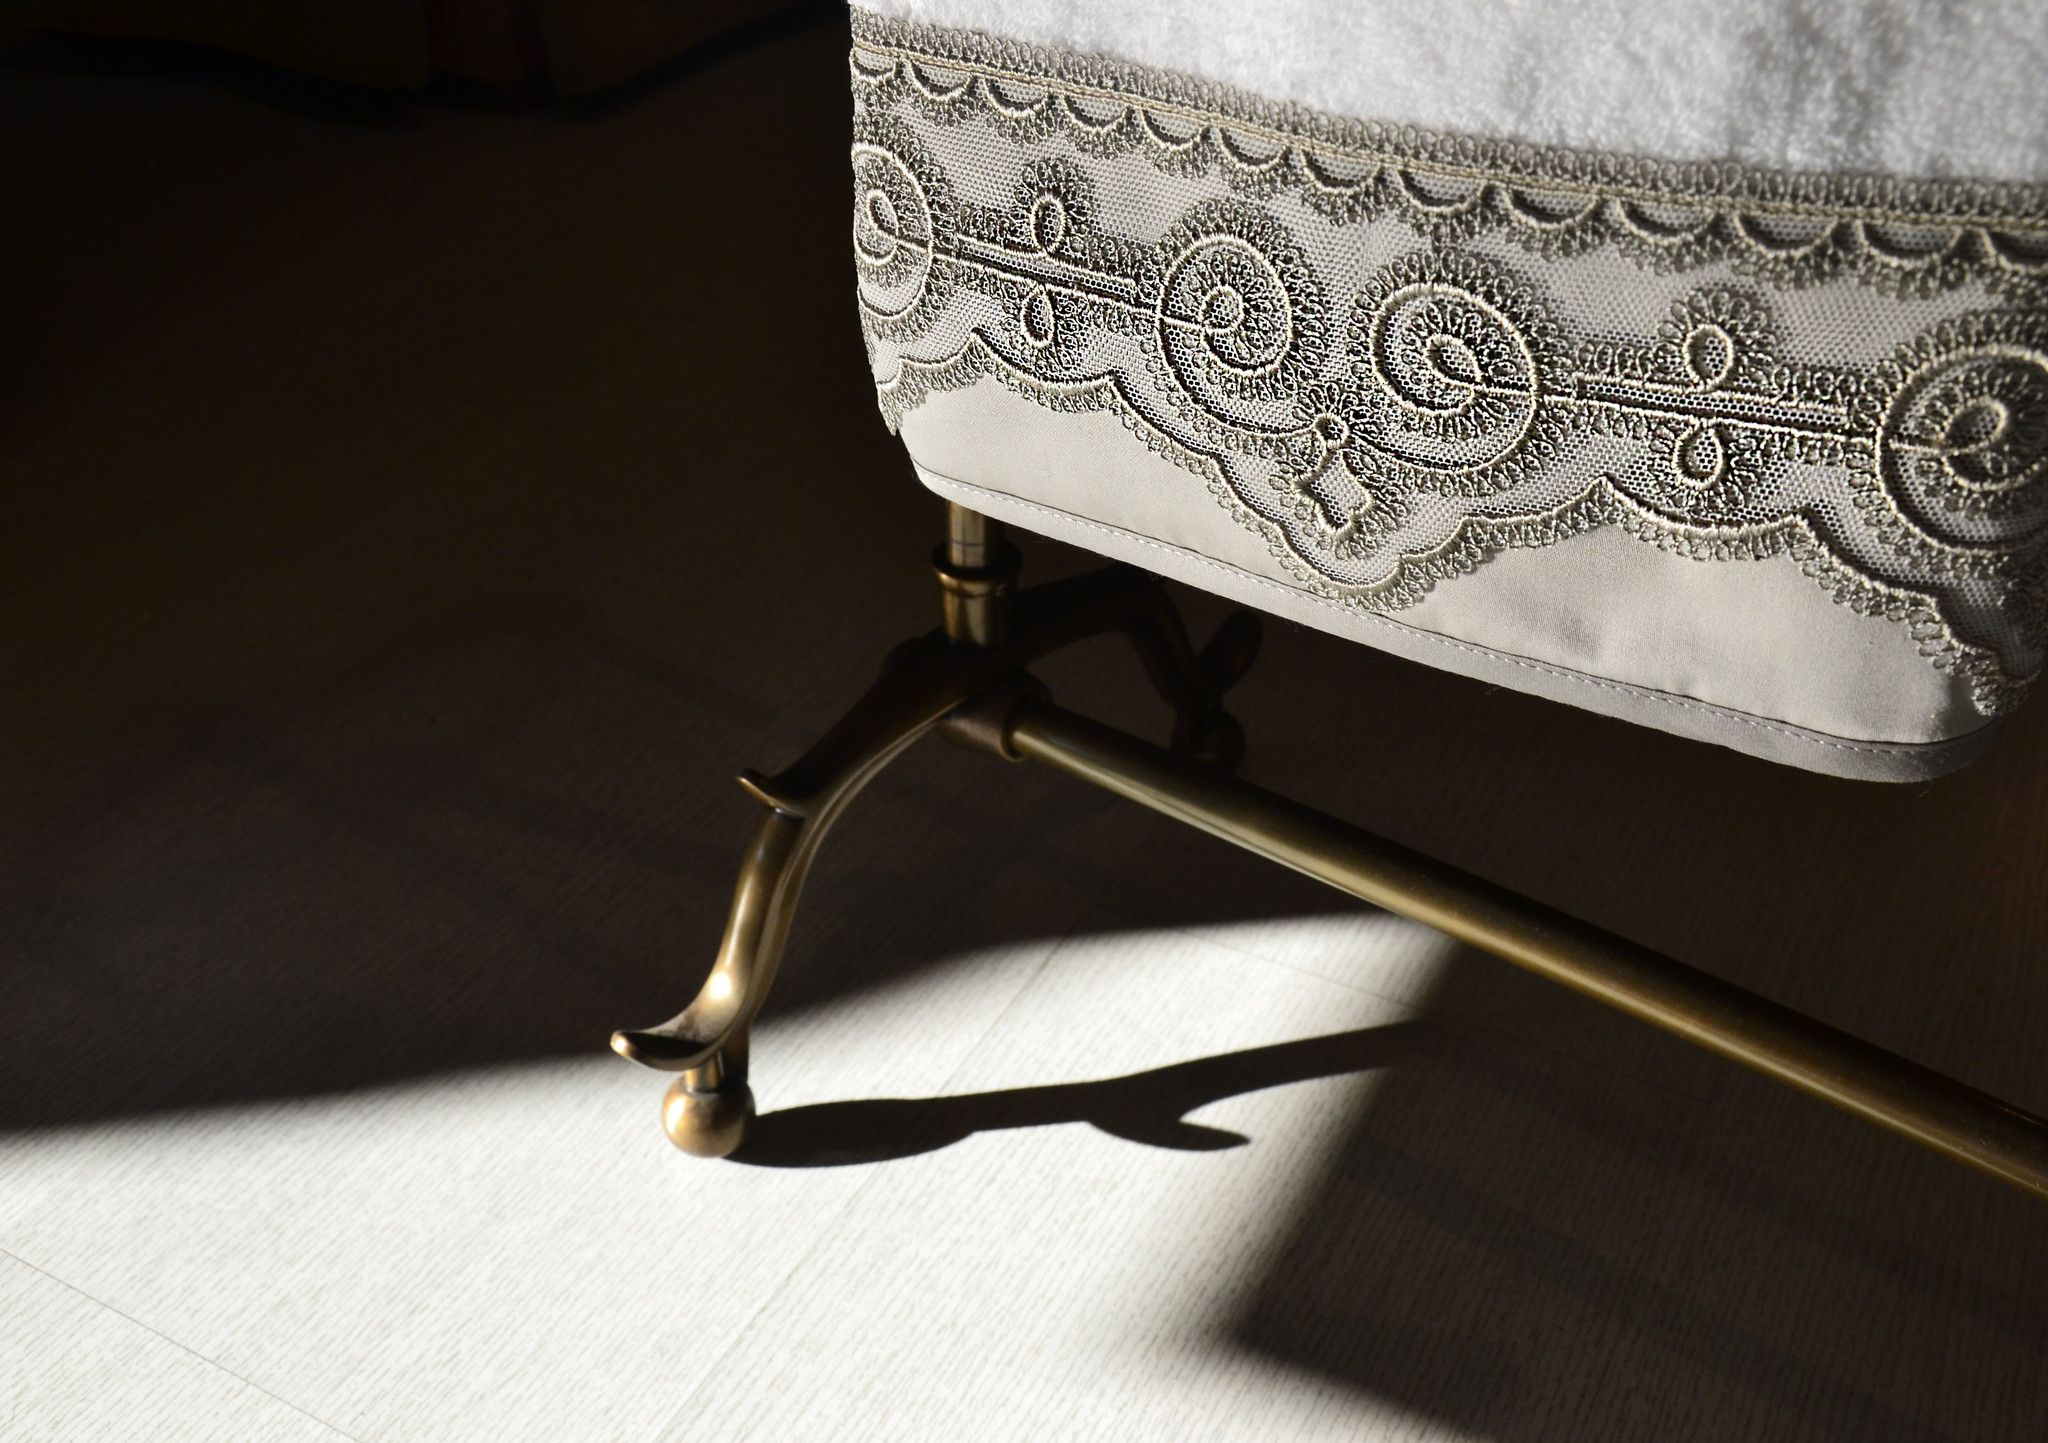 Spugne Zivago - Maison Claire